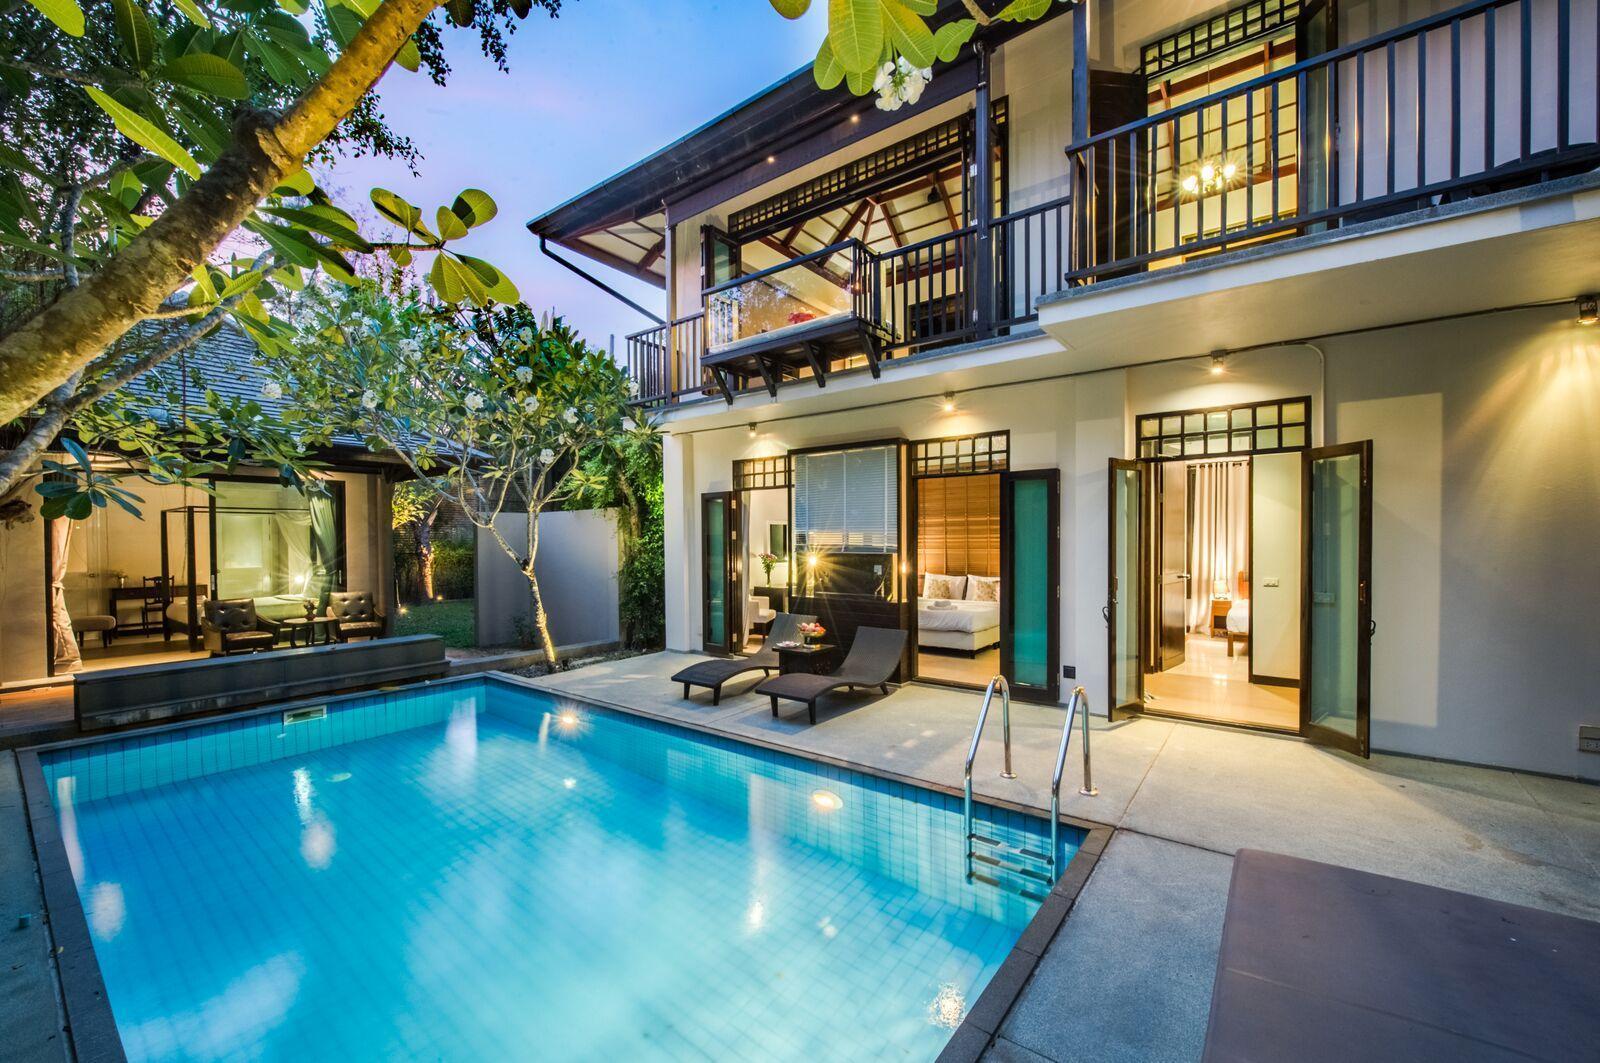 Phureesala Pool Villa 3 bedrooms (A2) วิลลา 3 ห้องนอน 4 ห้องน้ำส่วนตัว ขนาด 400 ตร.ม. – บางเทา